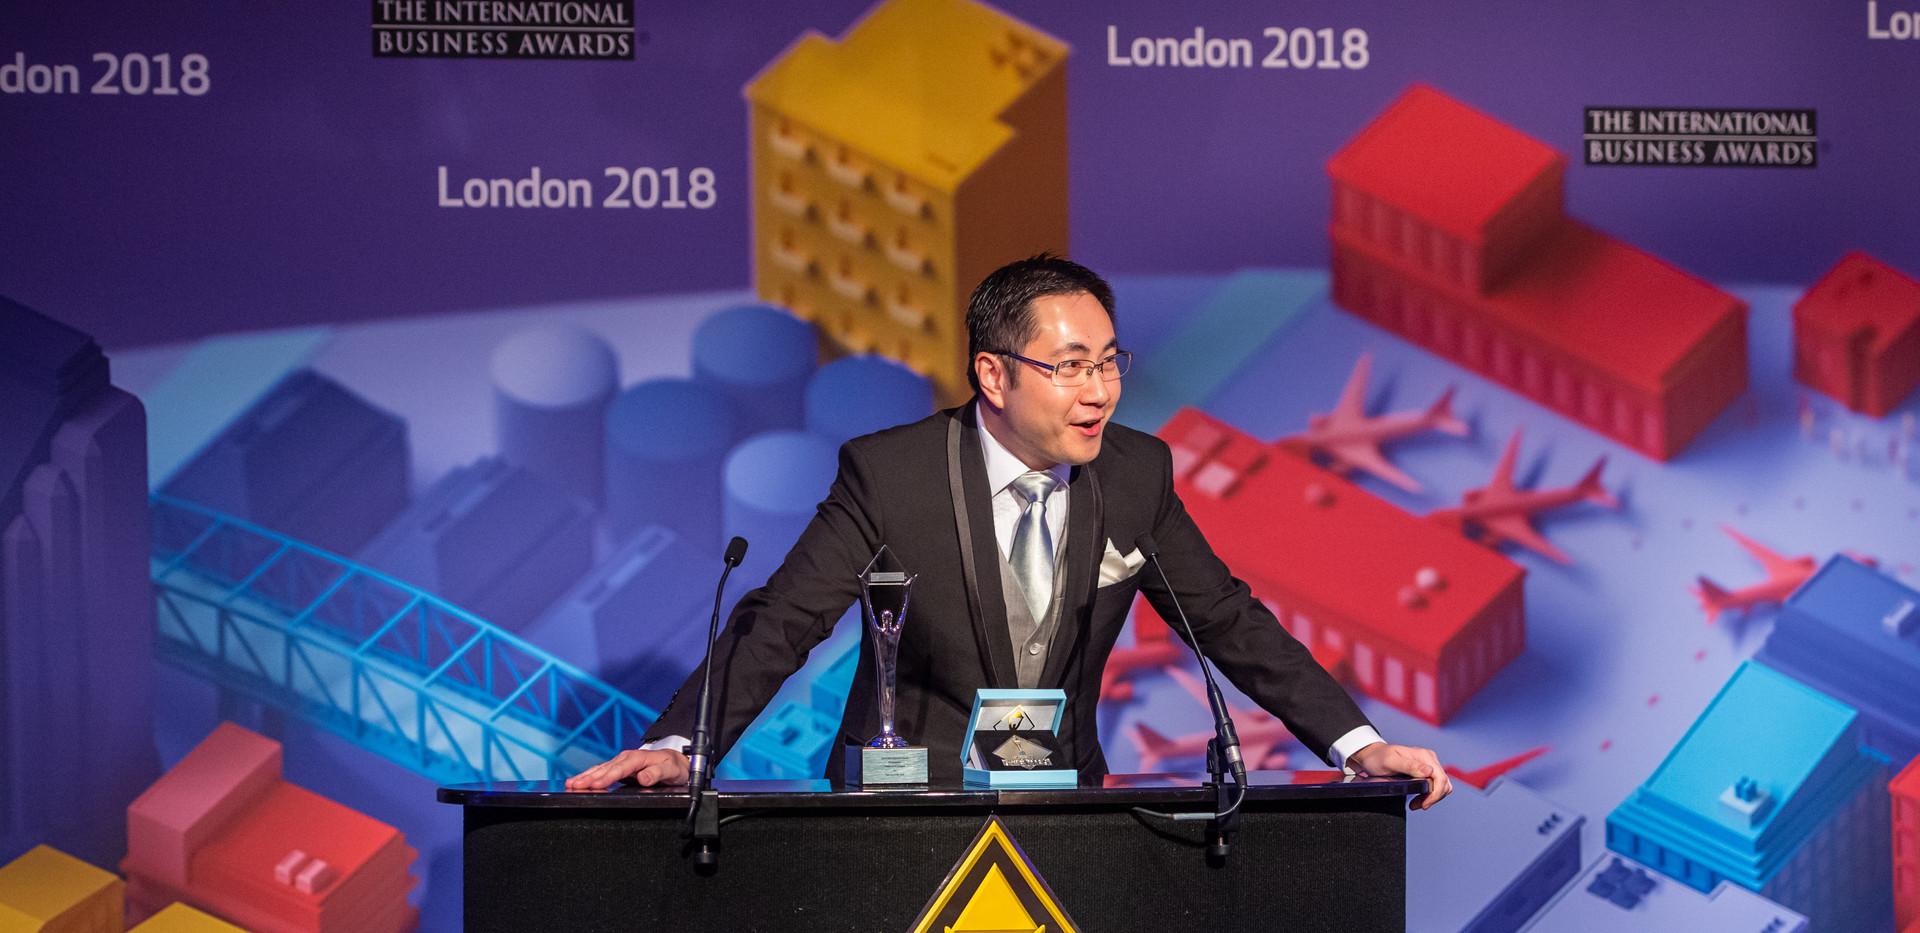 Mr. Kenneth K.Y. Poon received IBA 2018